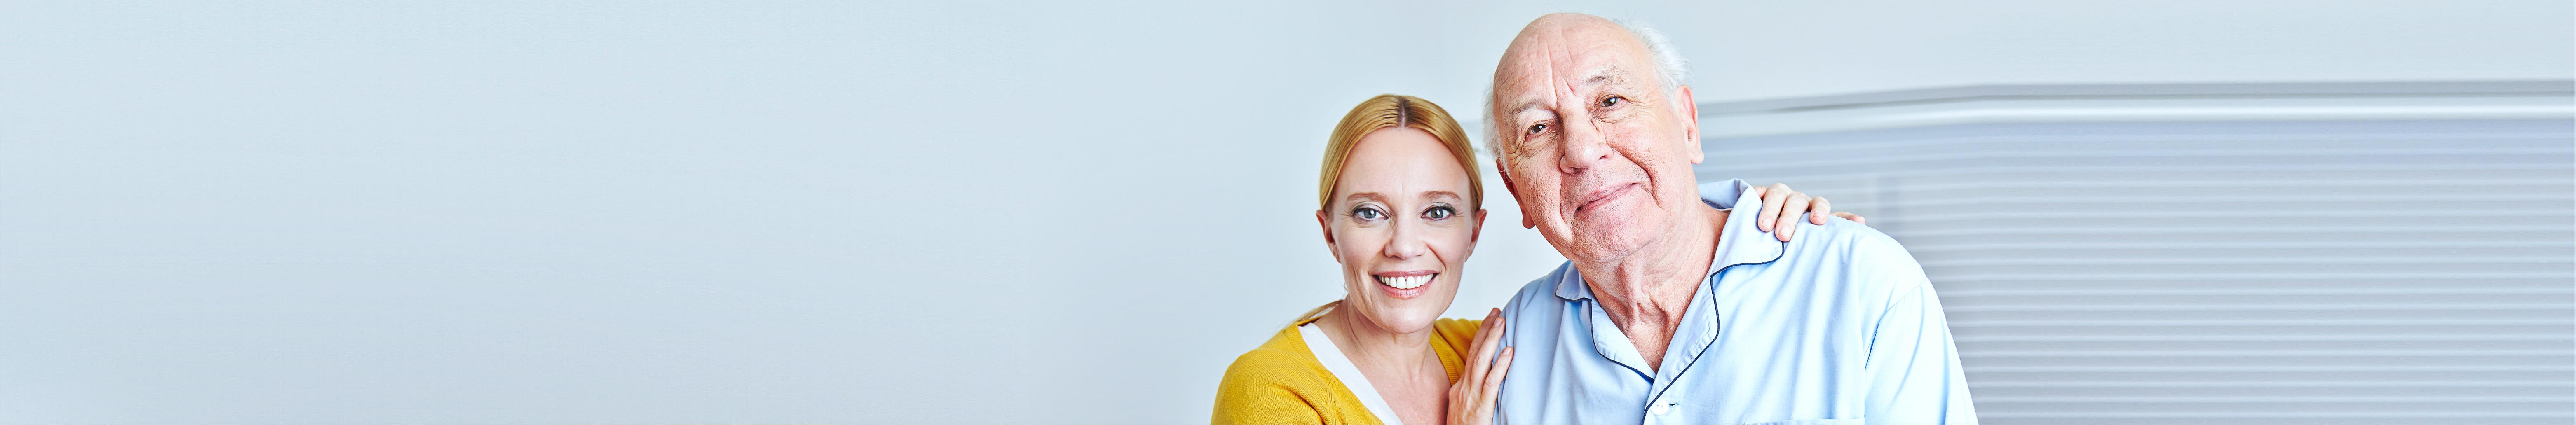 Smiling caregiver nursing senior men in family at home